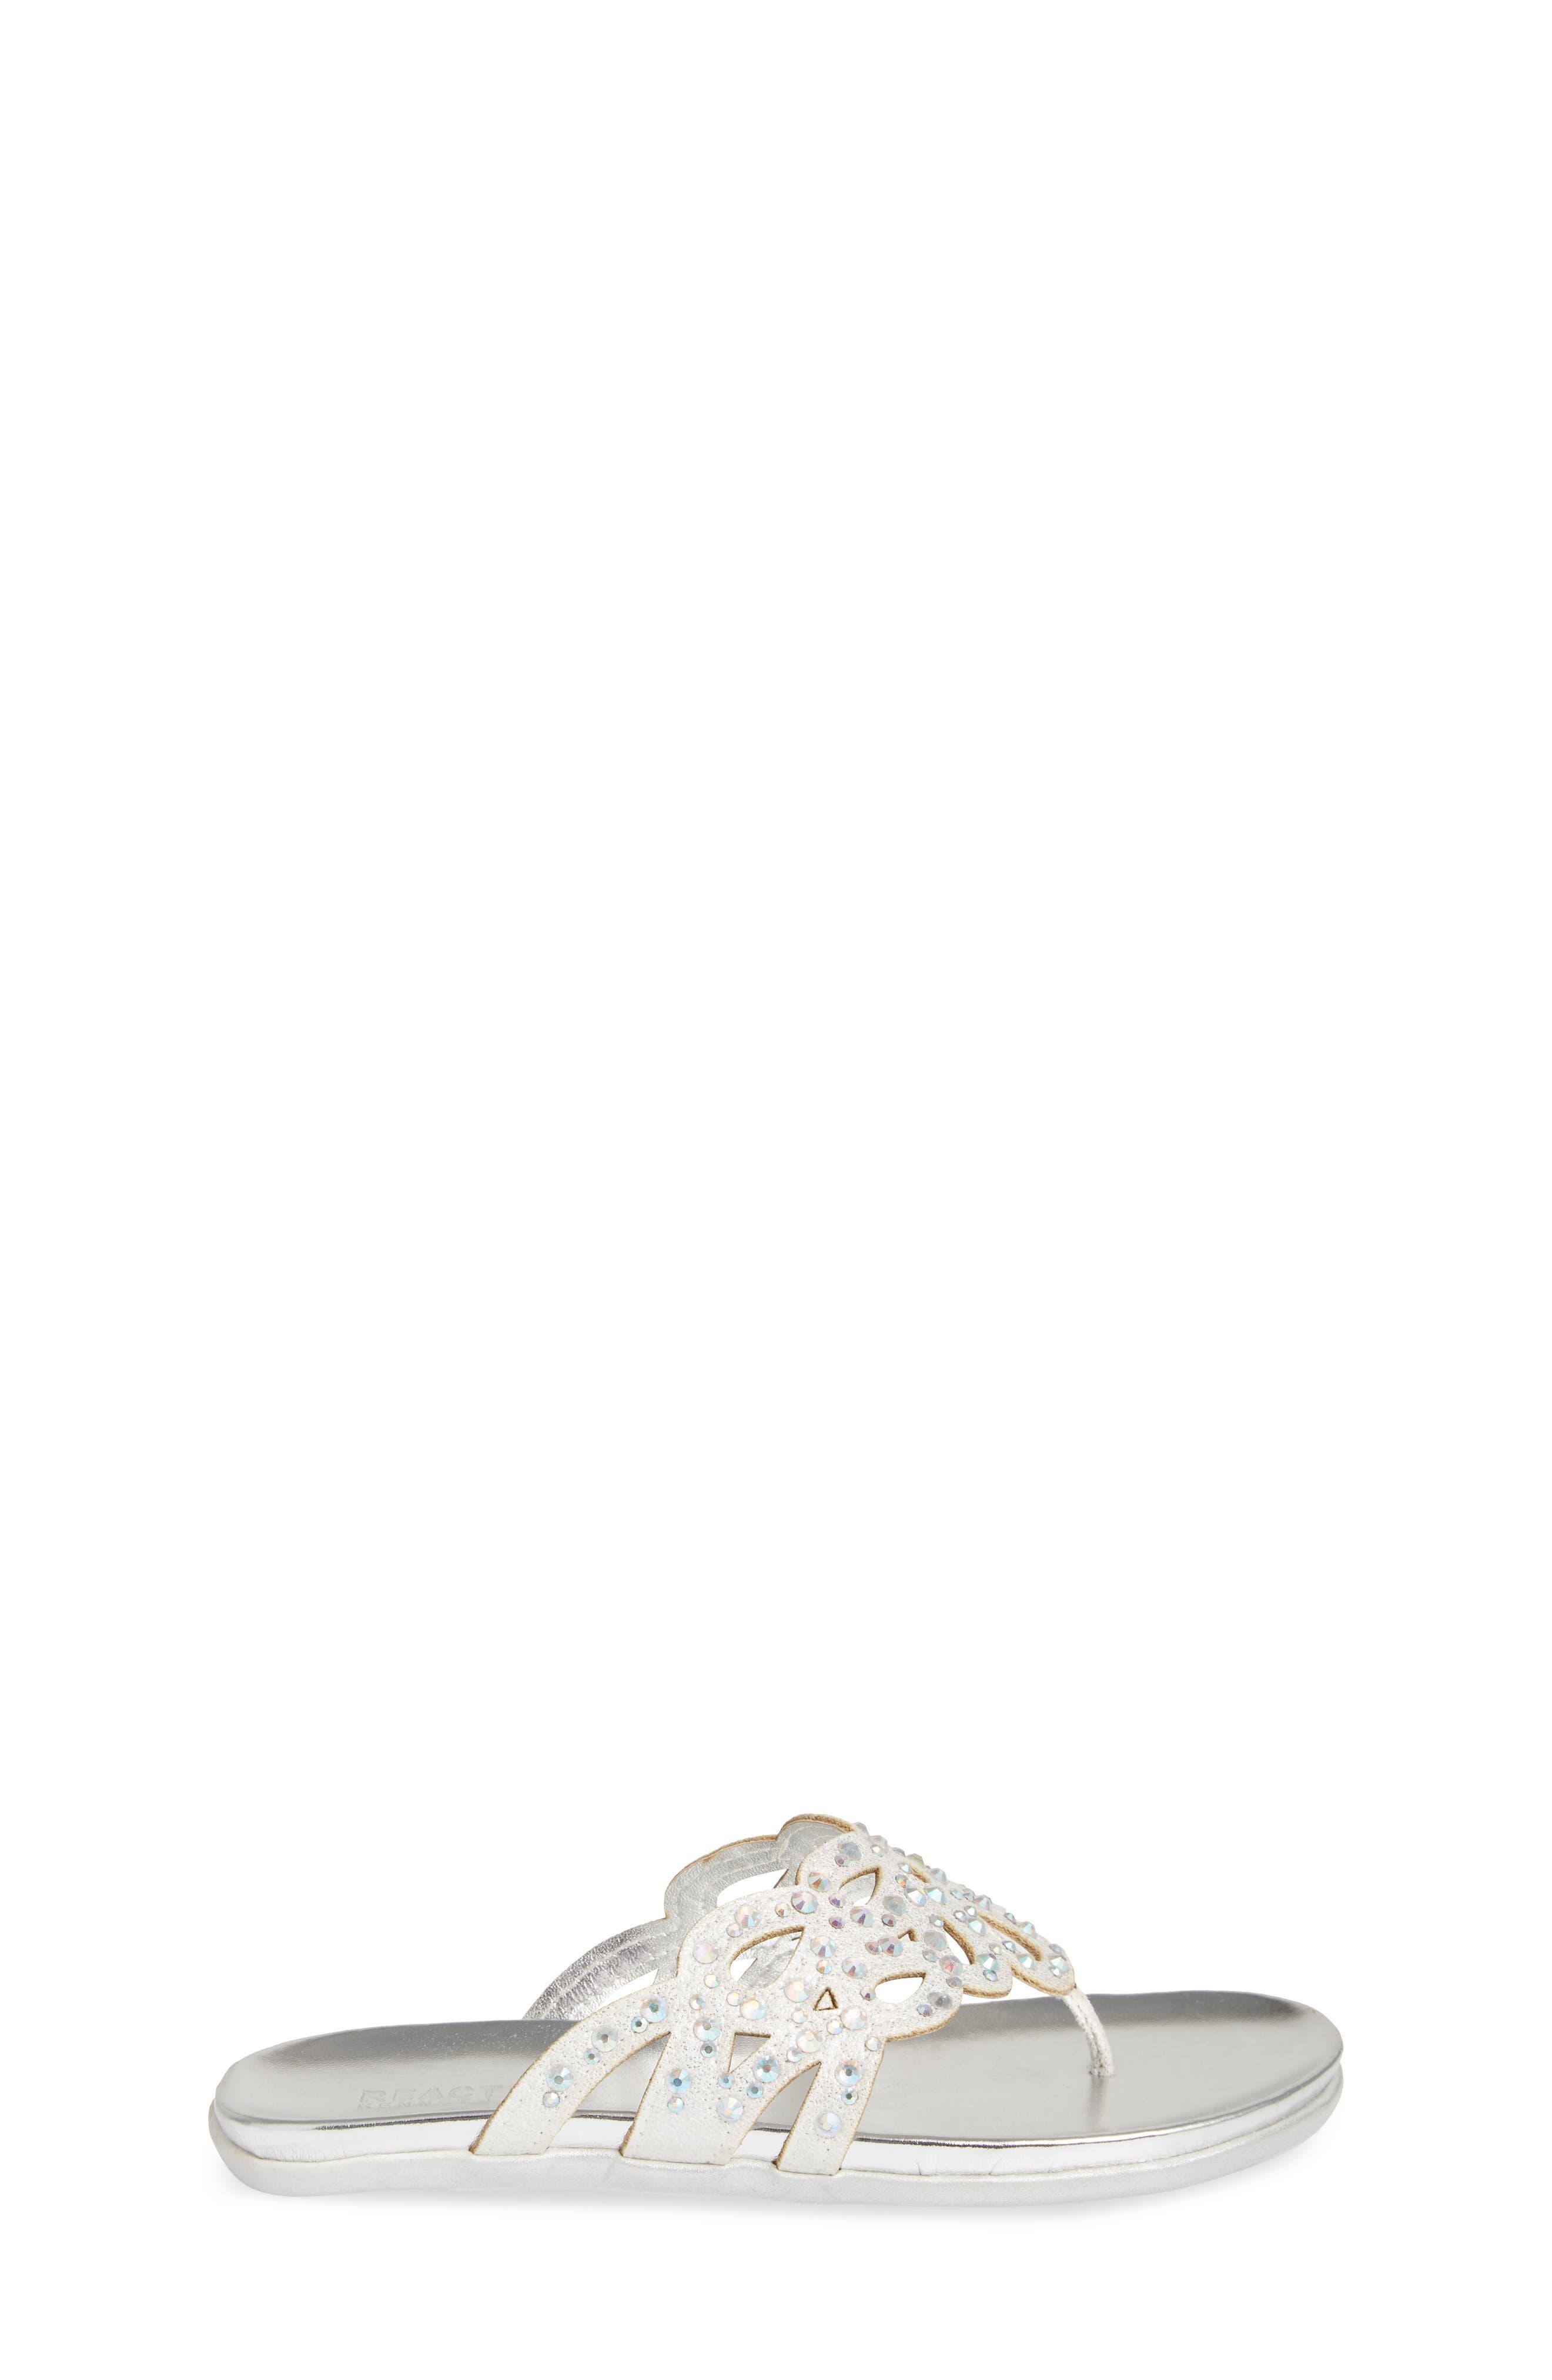 Kenneth Cole New York Flutter Metallic Crystal Thong Sandal,                             Alternate thumbnail 3, color,                             044